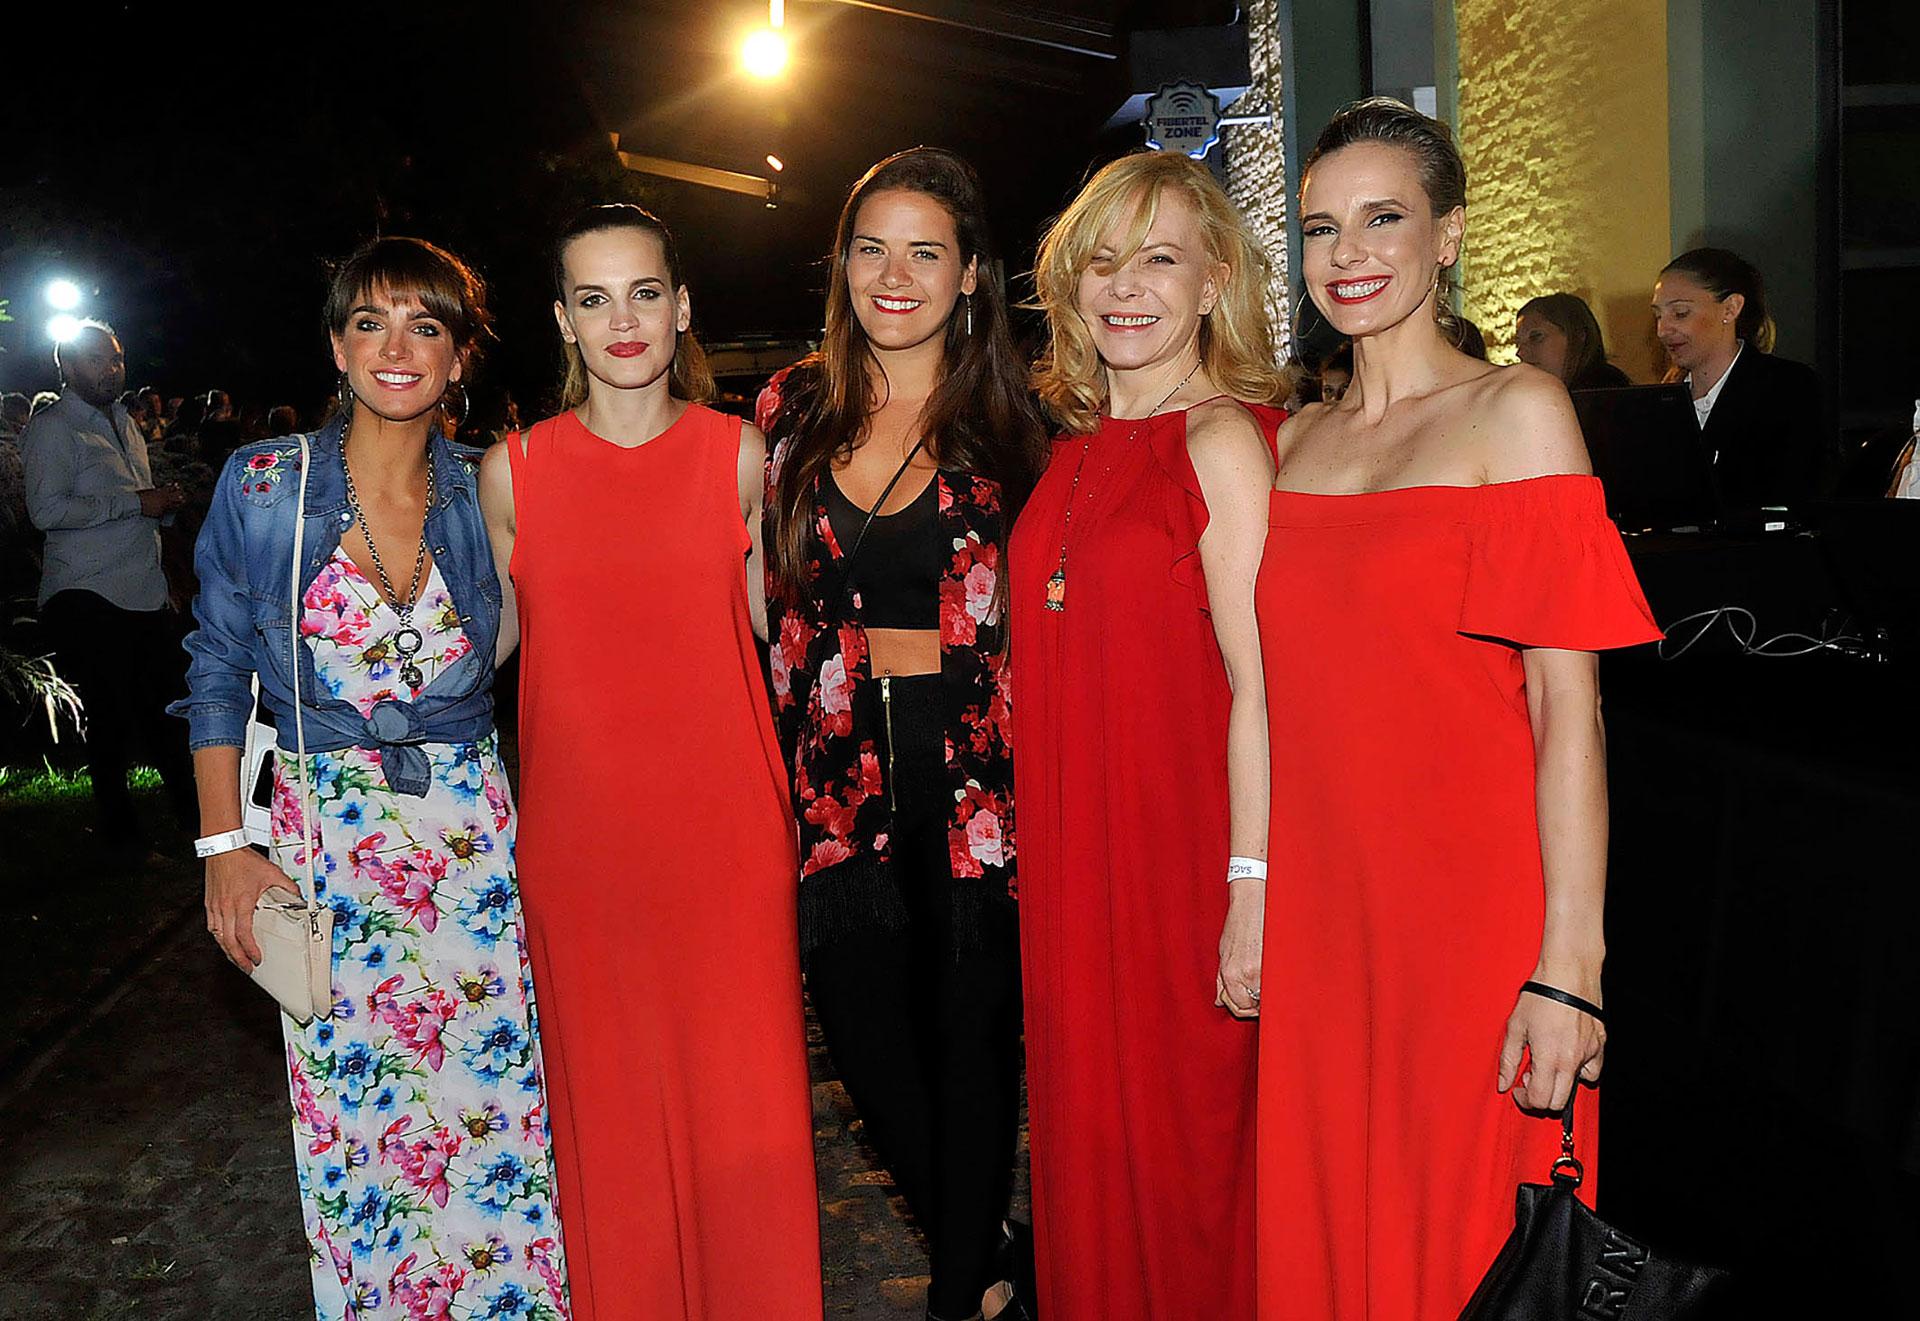 Gabriela Sari, Sabrina Garciarena, Mica Vázquez, Cecilia Roth, Julieta Cardinali